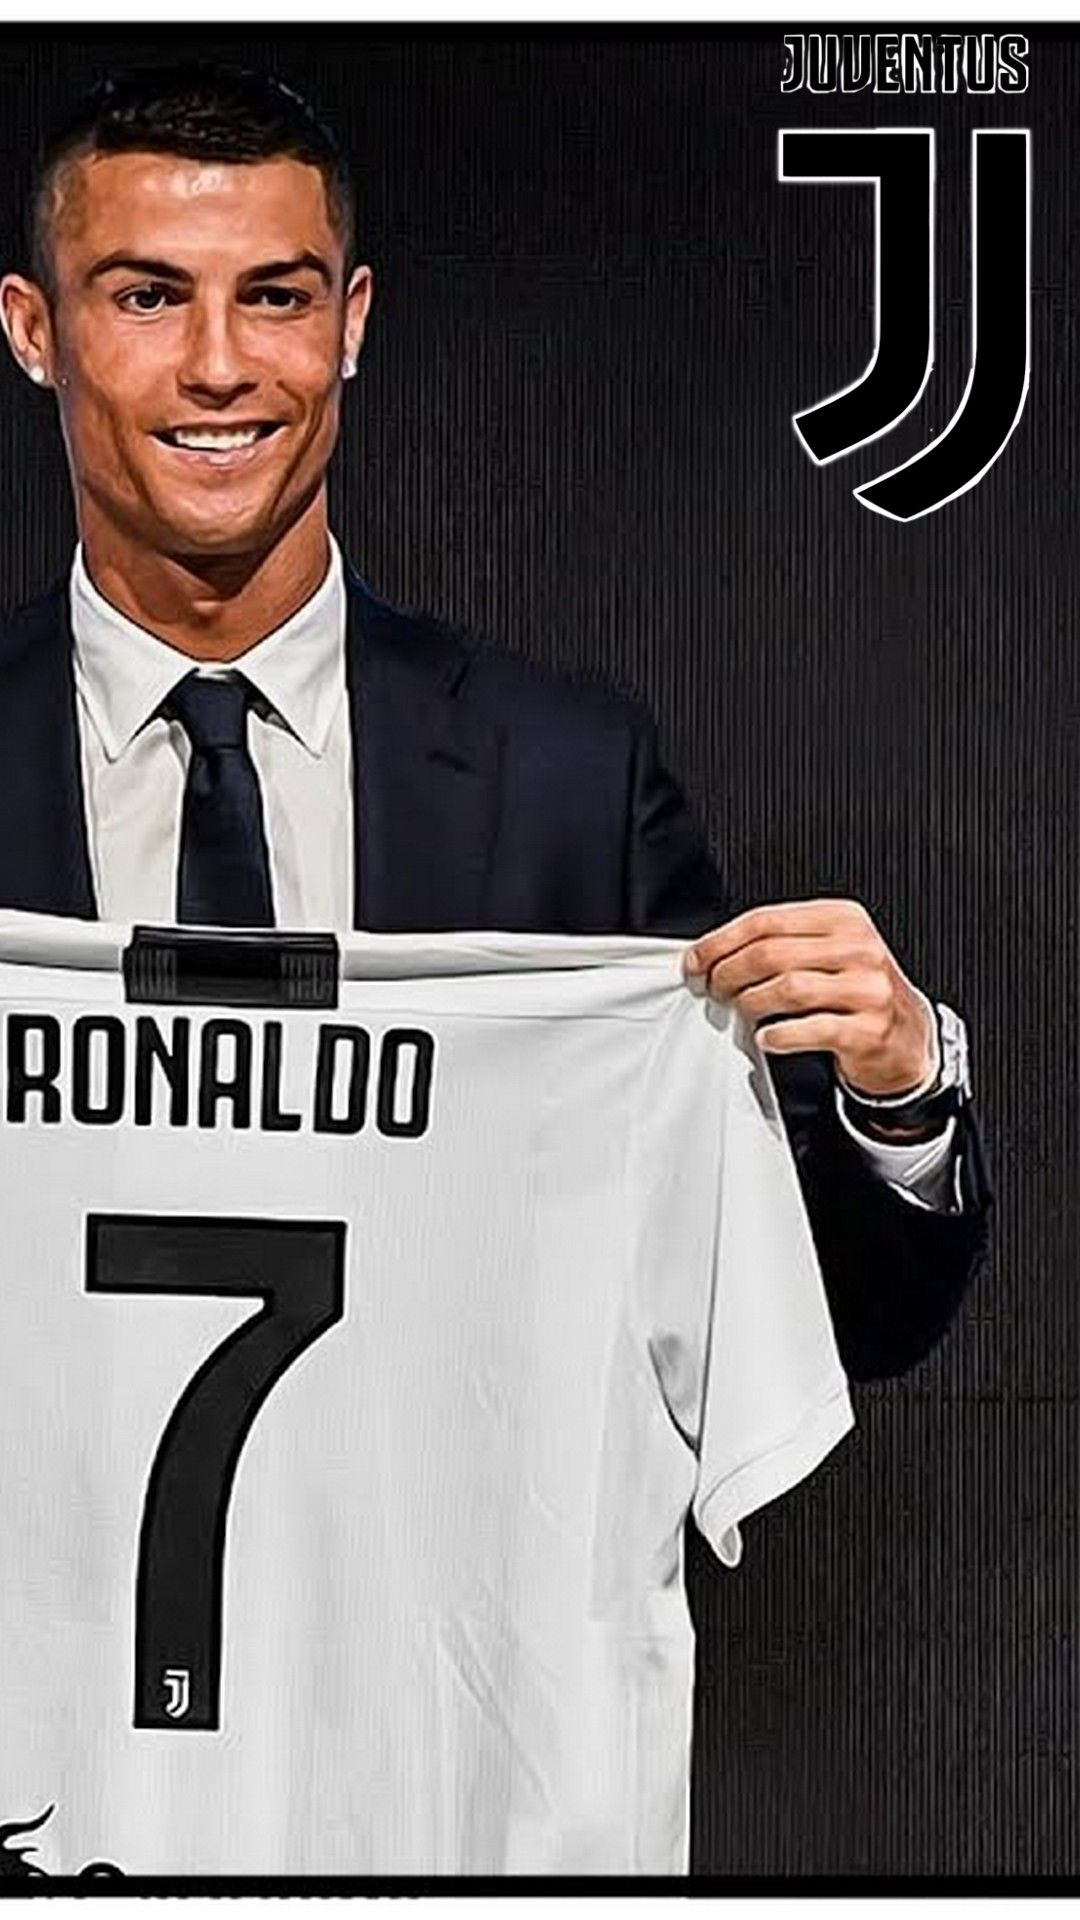 خلفيات كرستيانو رونالدو 2018 Hd Tecnologis Ronaldo Android Wallpaper Iphone Wallpaper